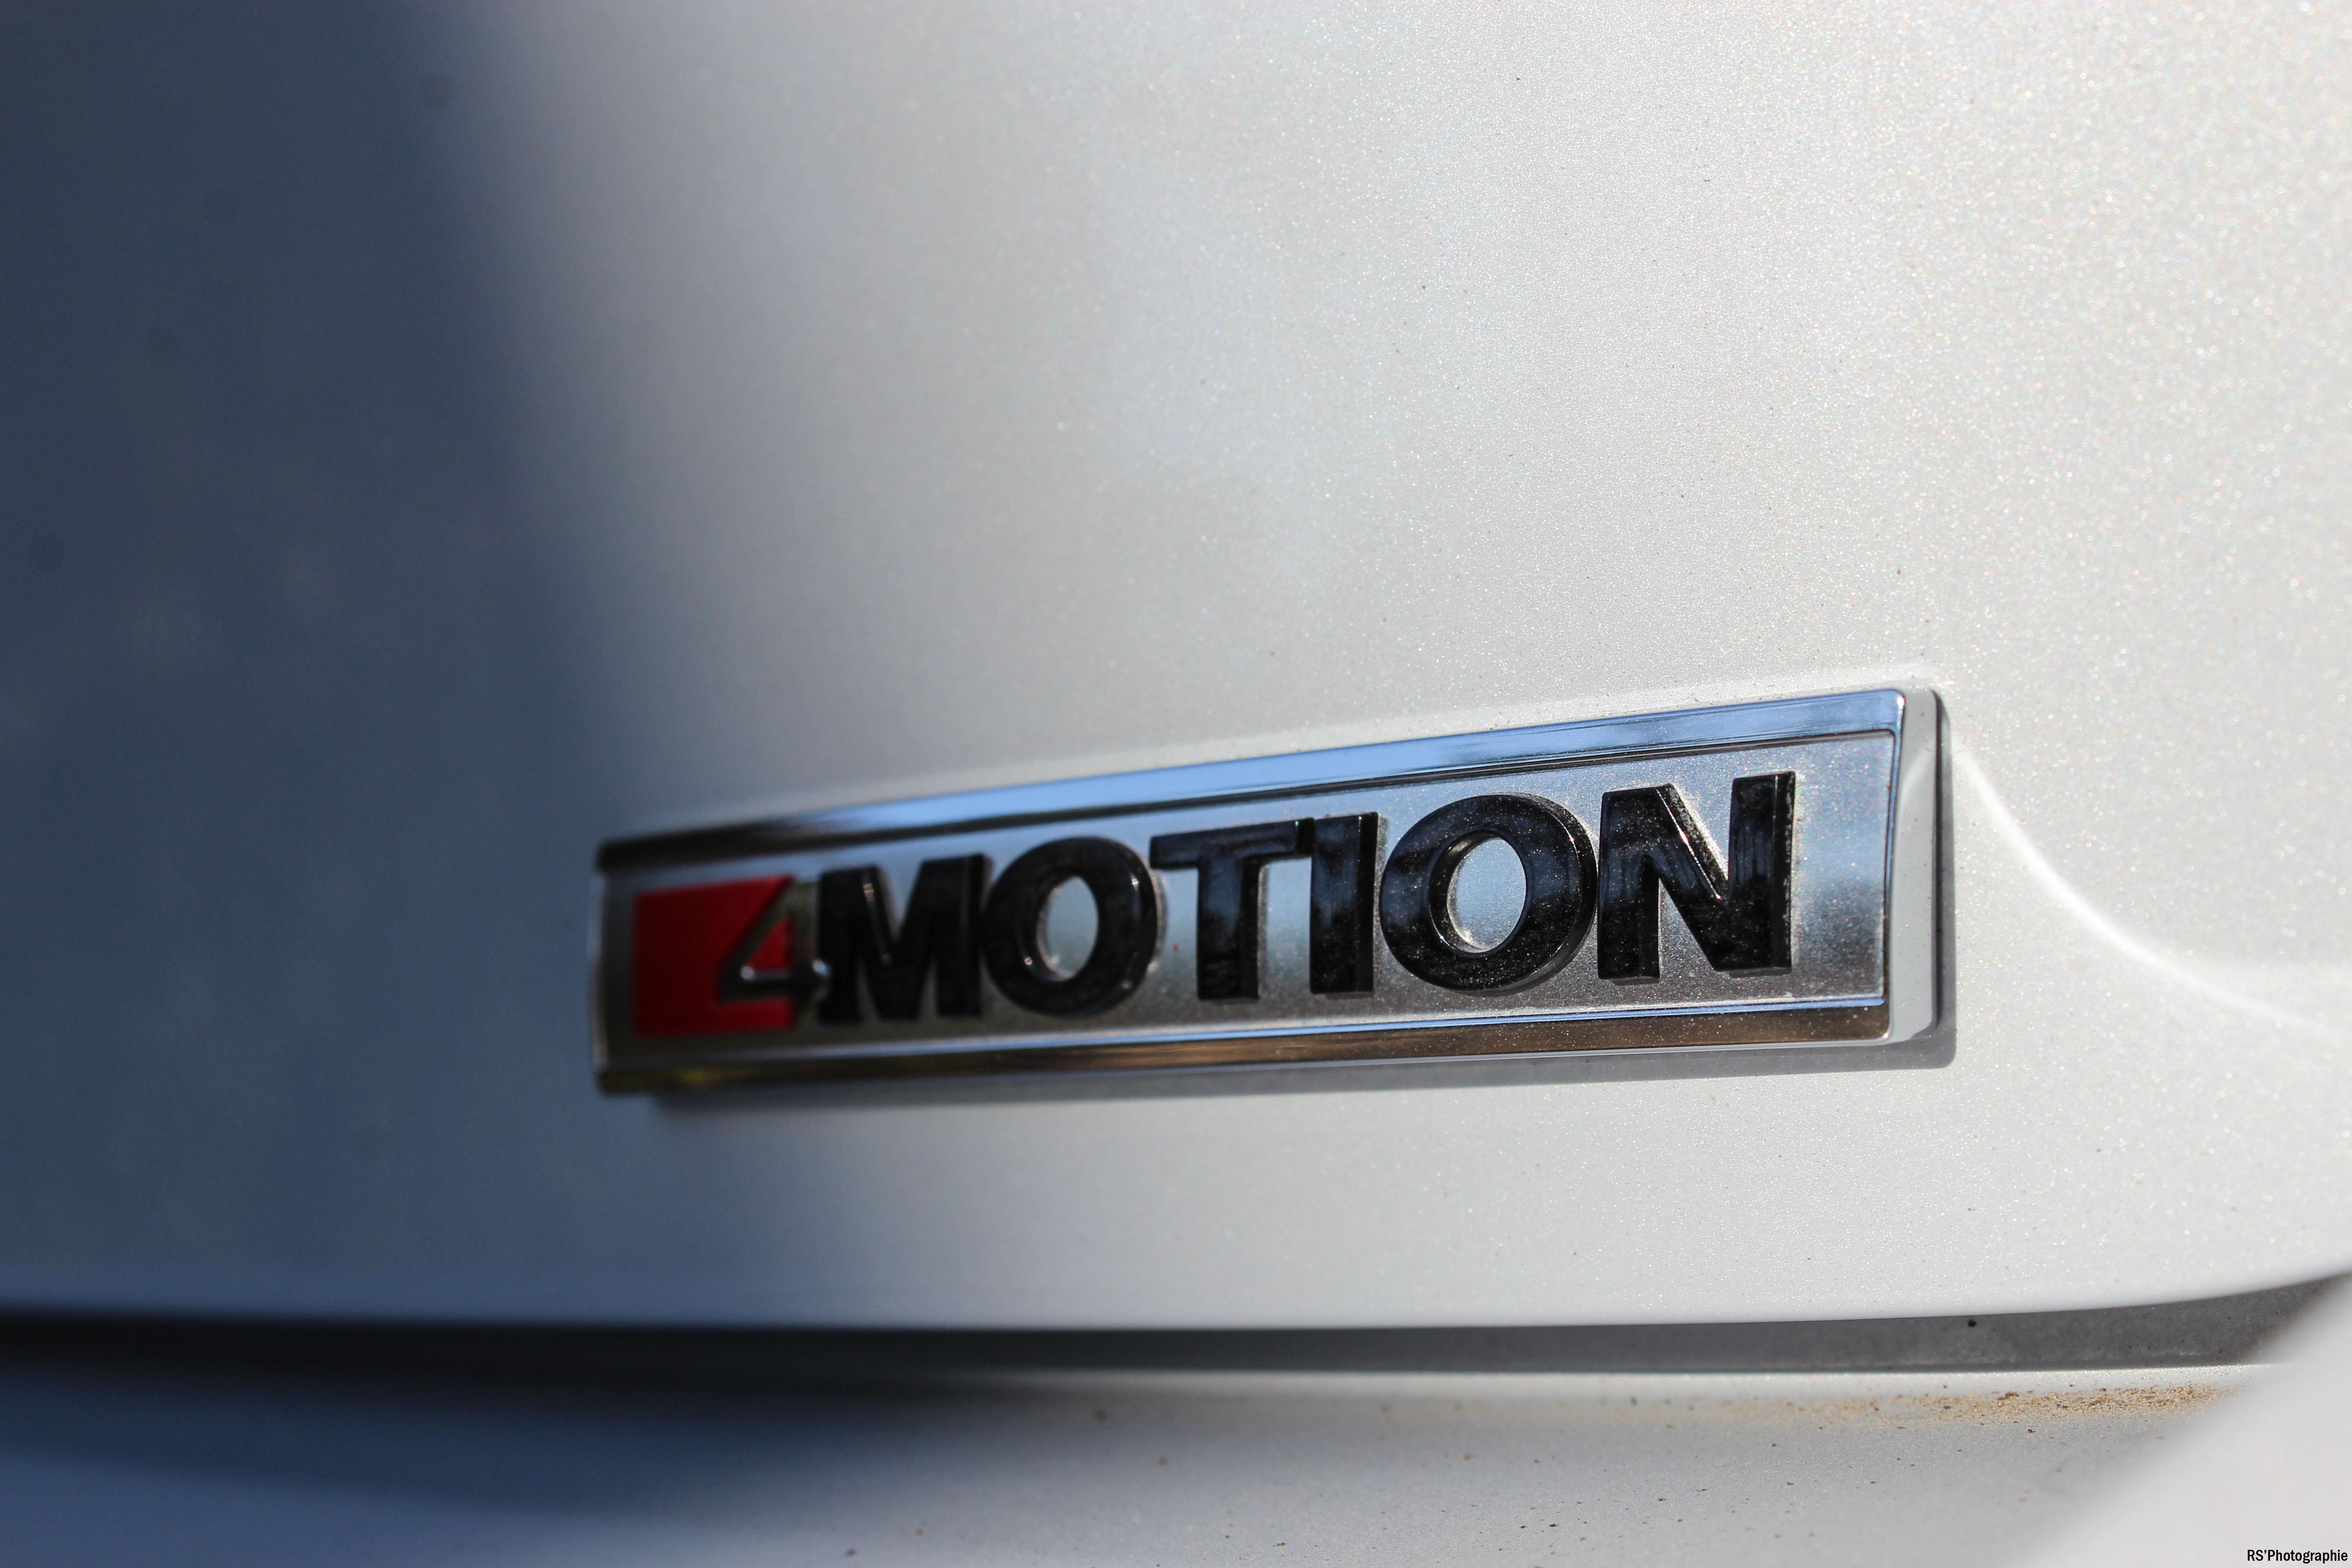 Volkswagentroc8-vw-t-roc-logo-Arnaud Demasier-RSPhotographie